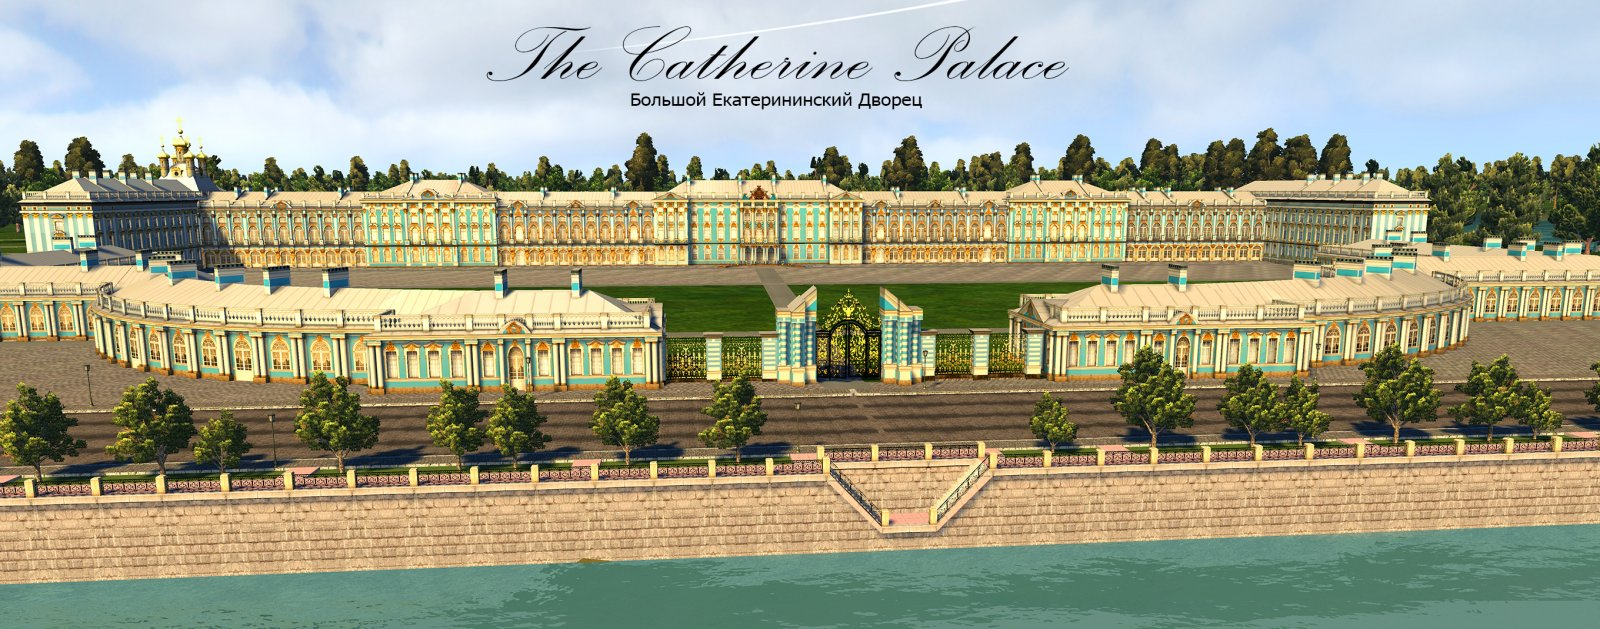 Екатерининский дворец общий вид 01.jpg